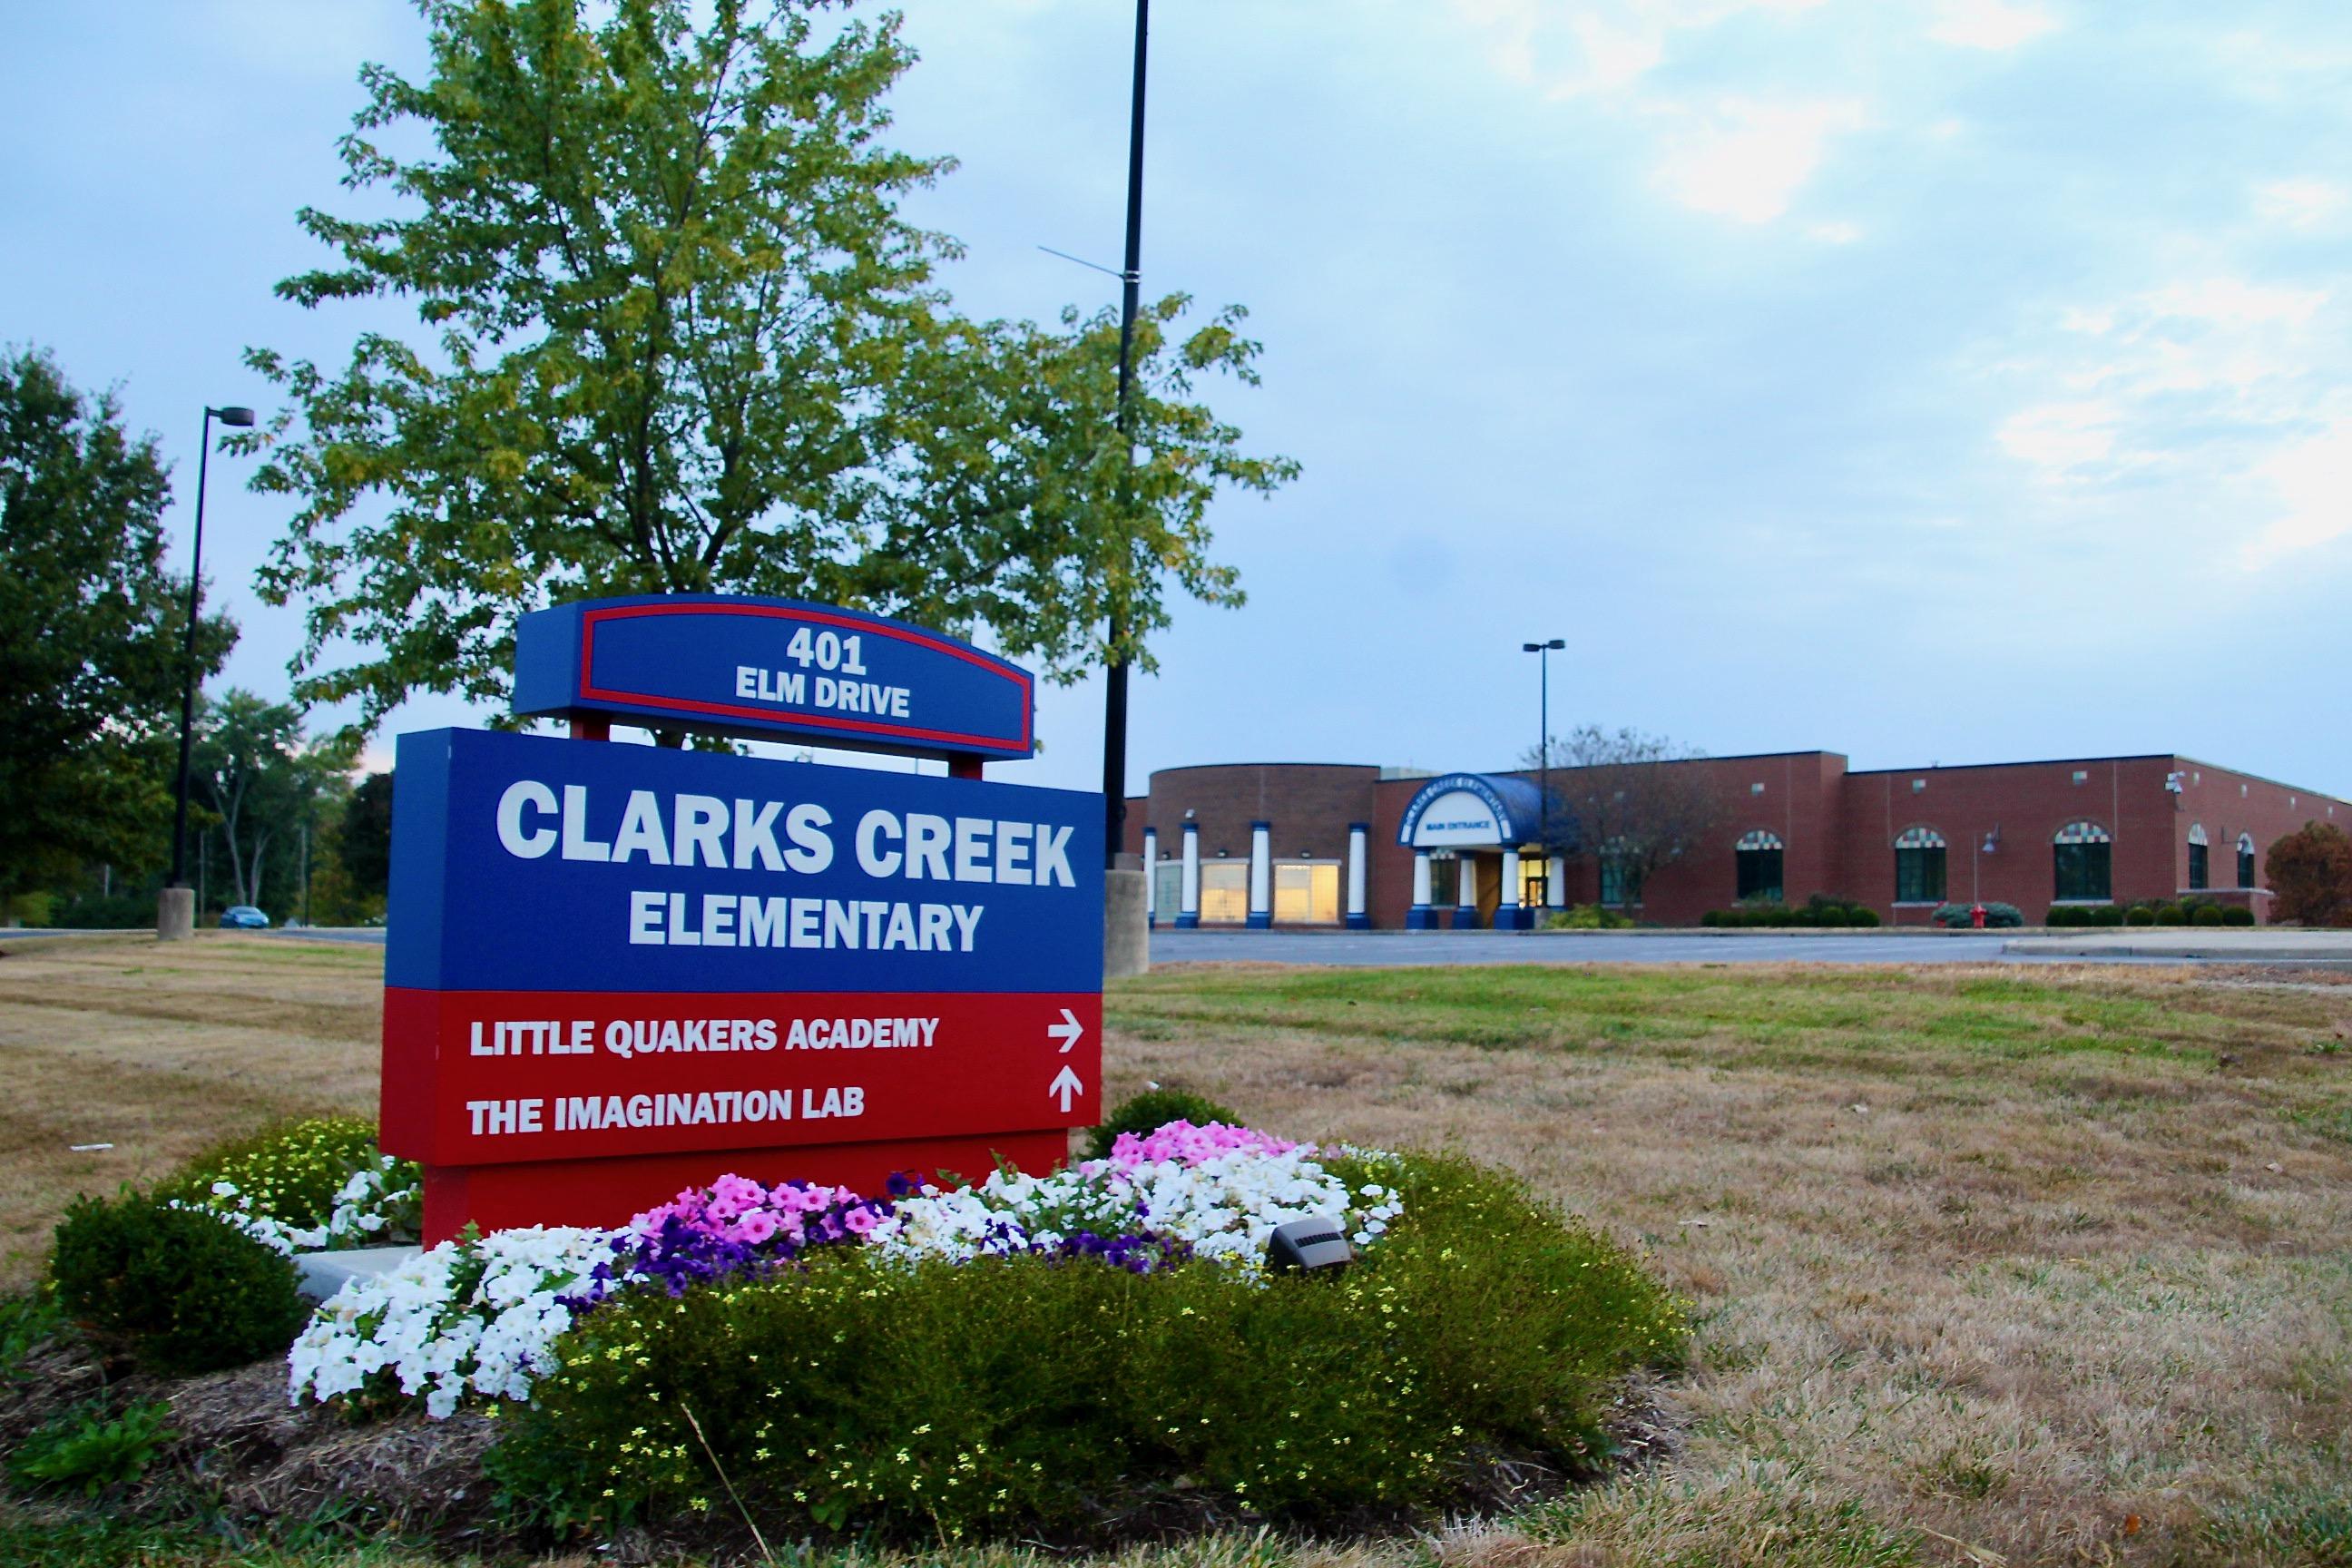 Clarks Creek Elementary